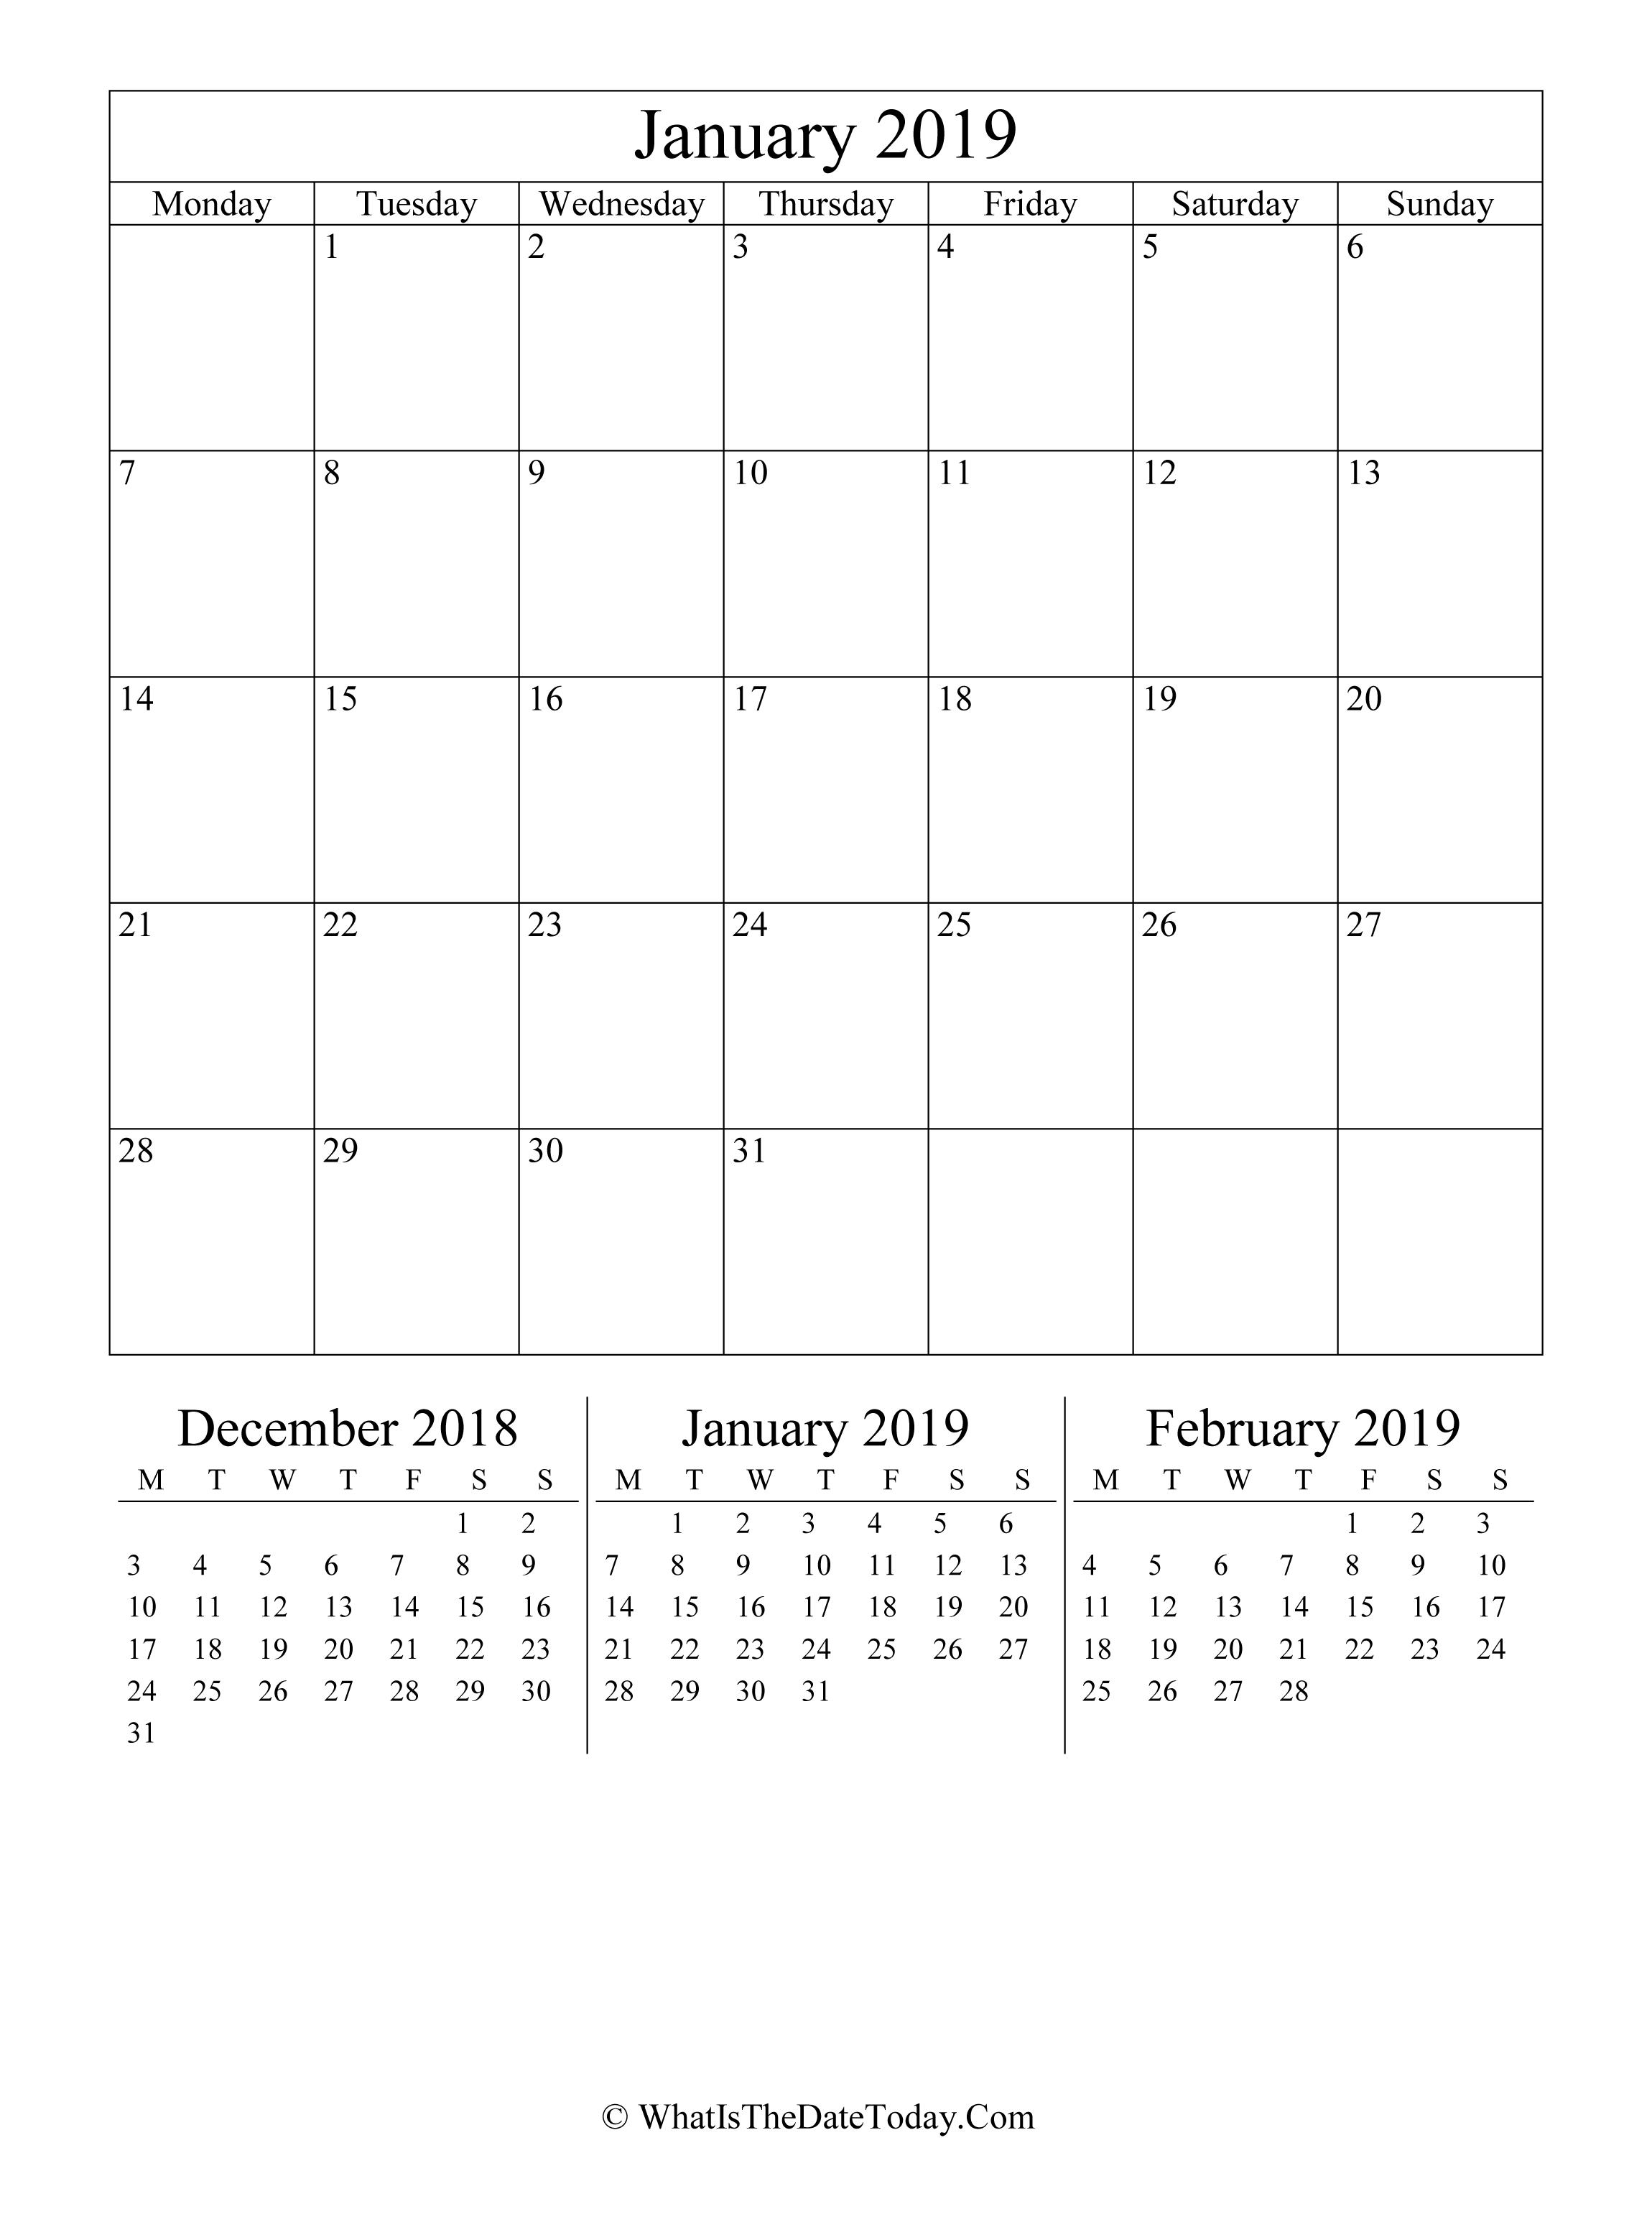 January 2019 Calendar Vertical January 2019 Editable Calendar (vertical layout